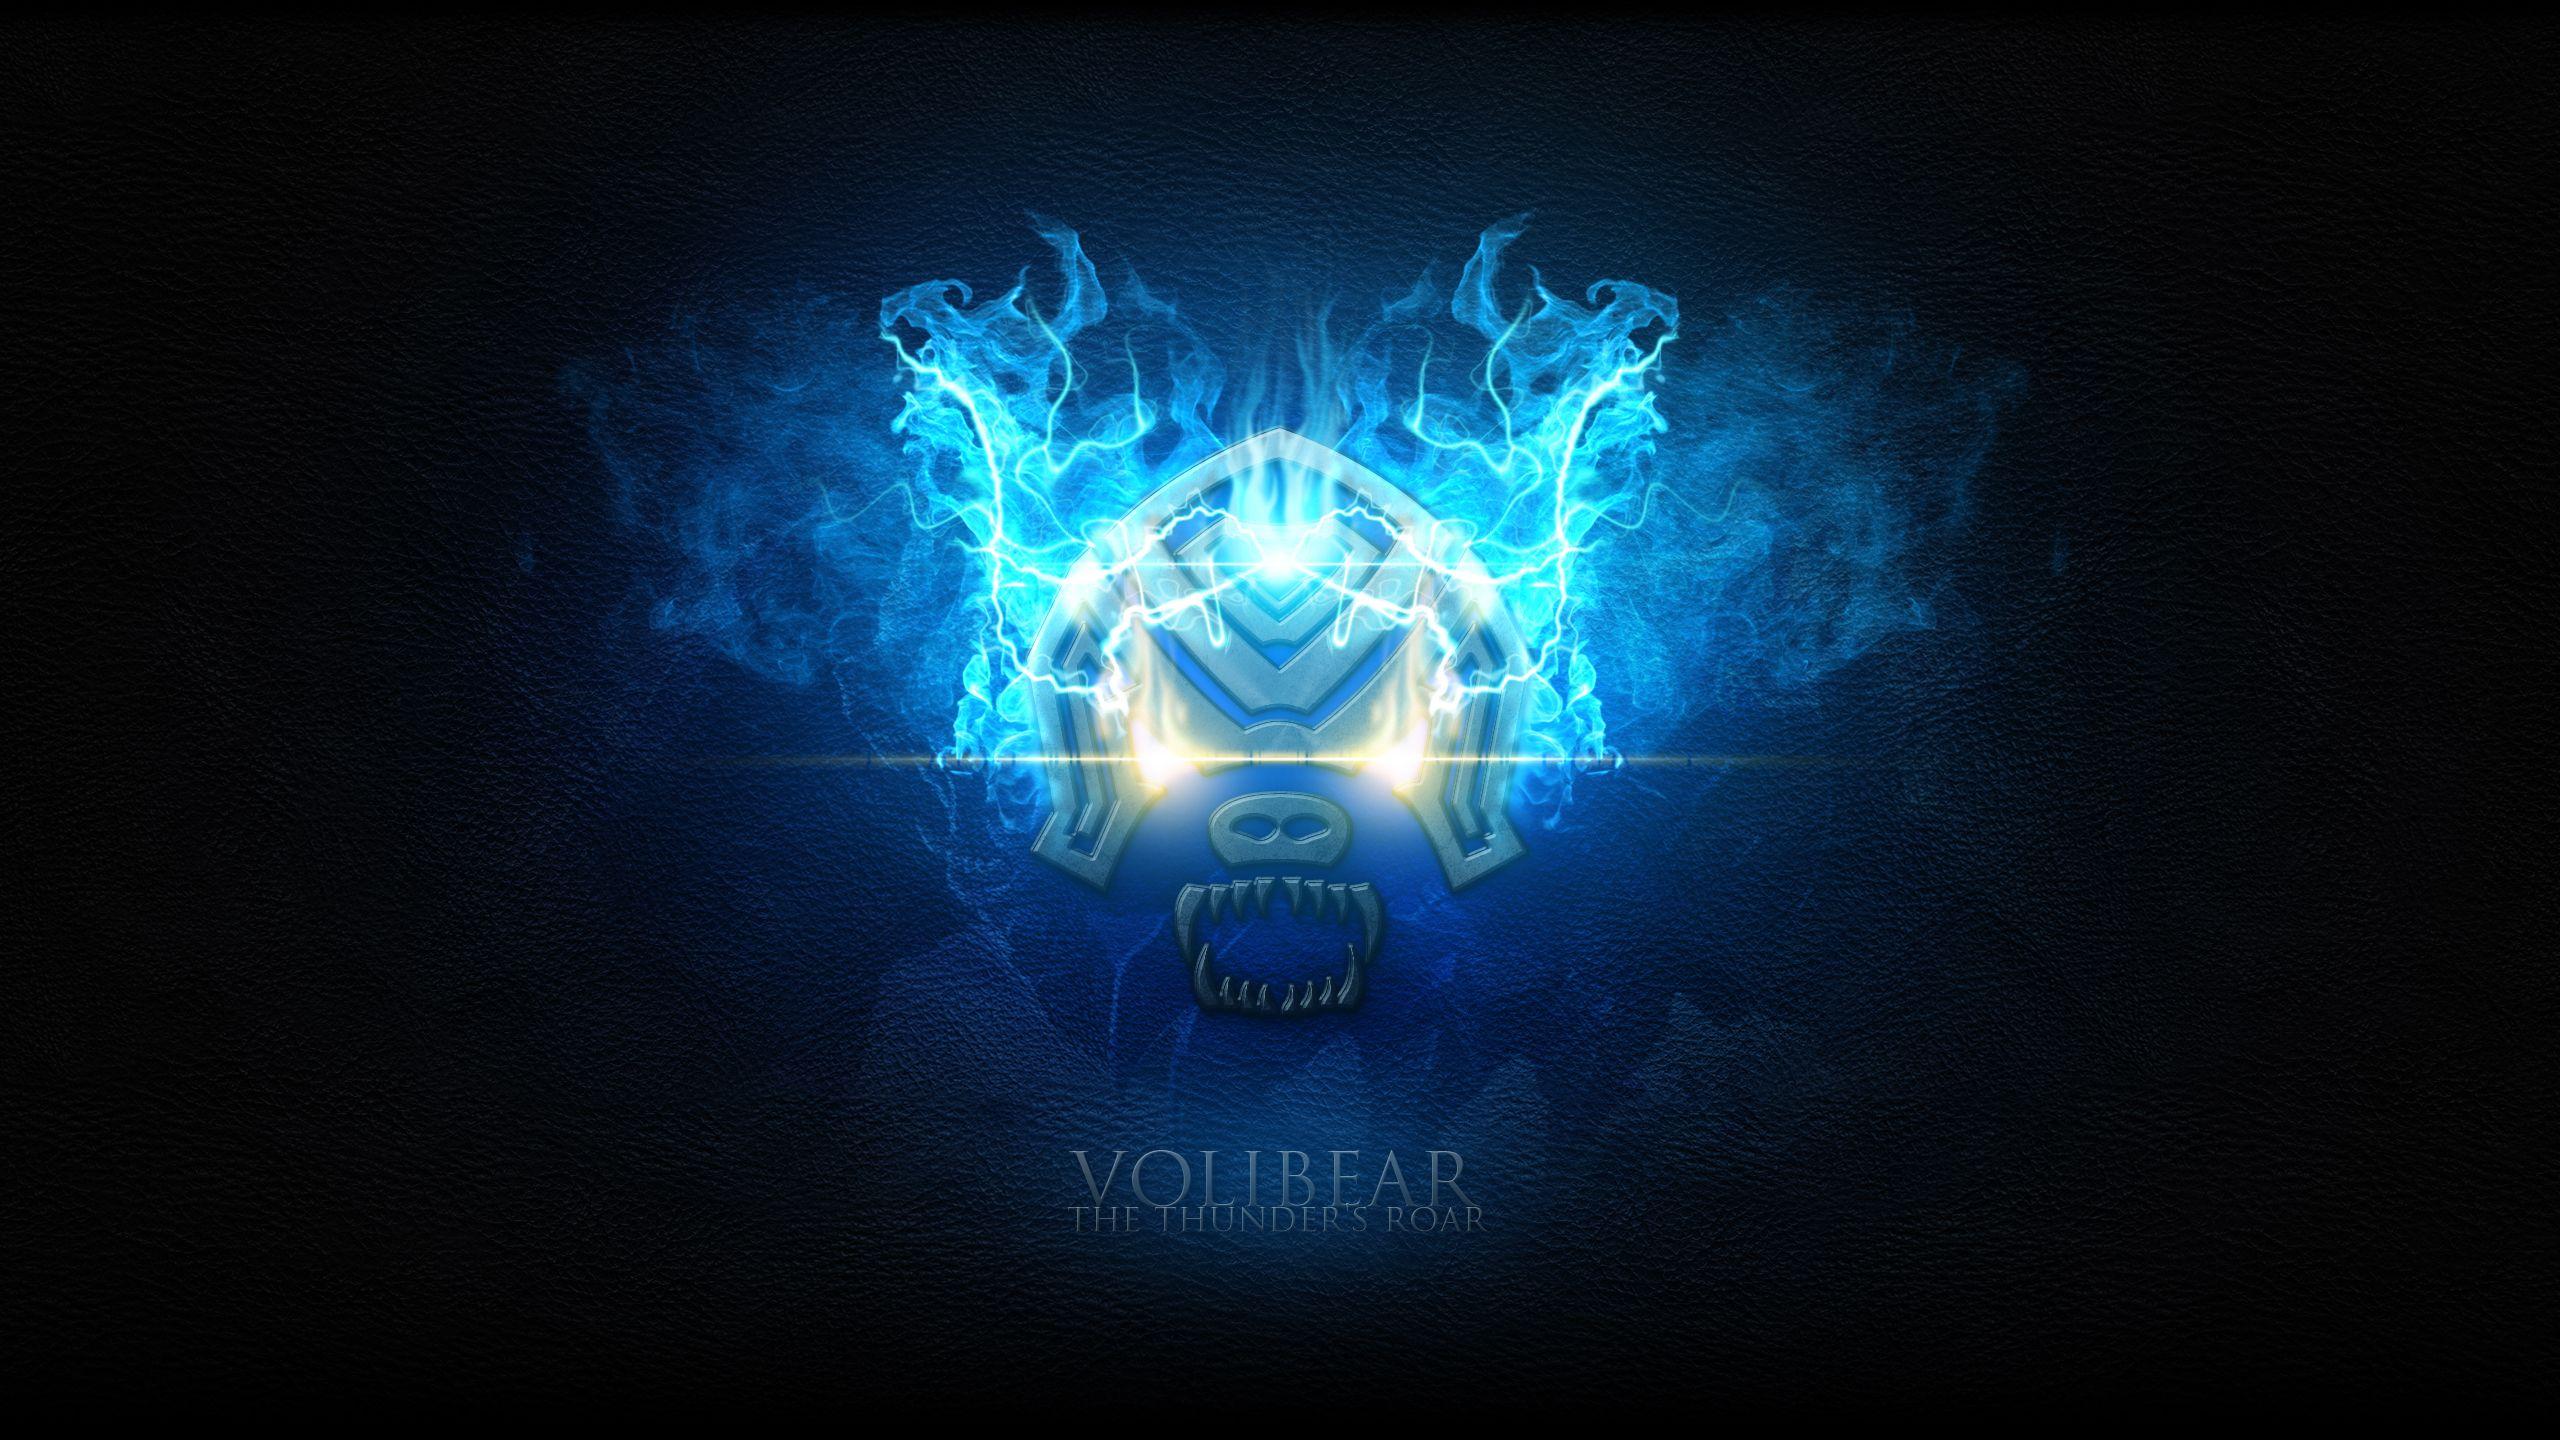 Volibear League Of Legends Wallpapers HD 1920x1080